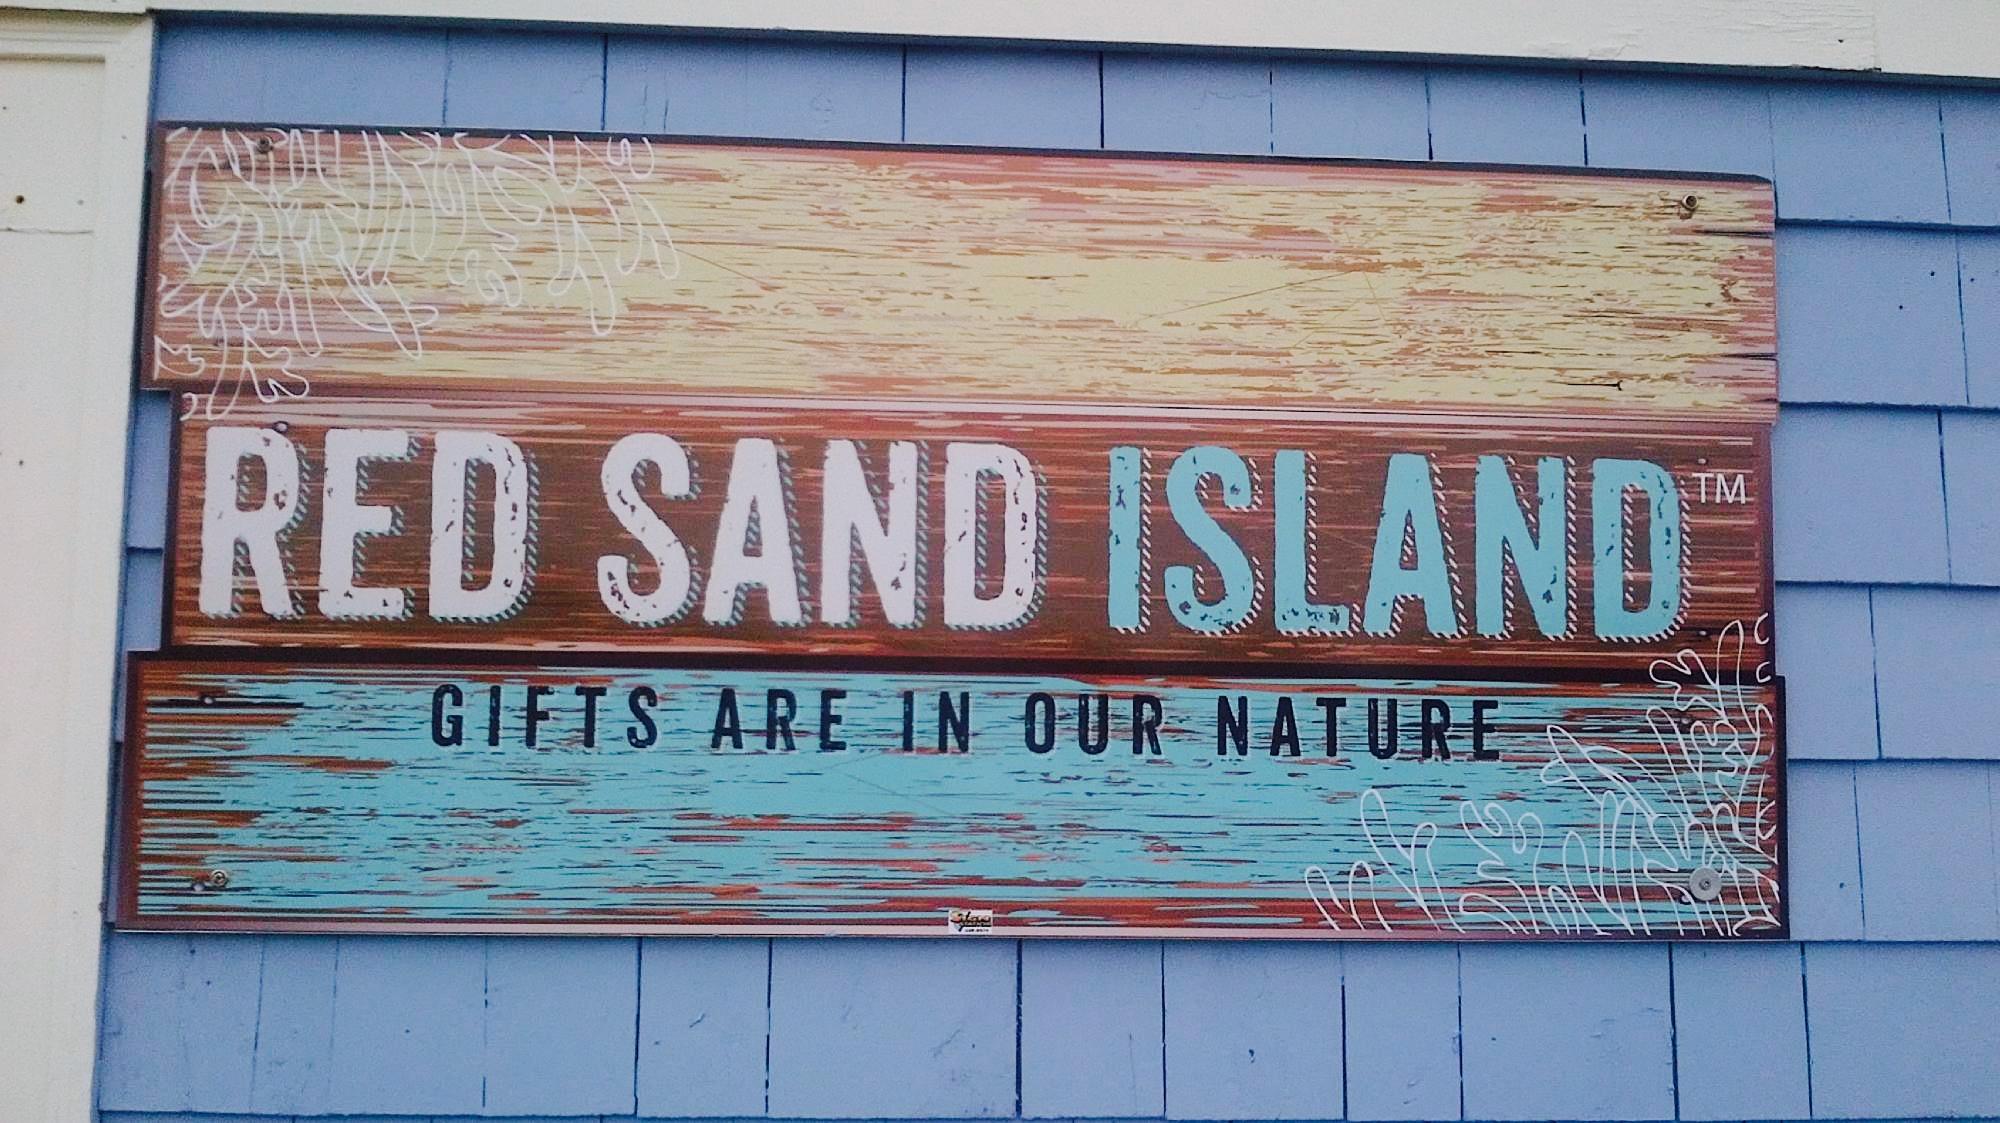 Red sands pei casino beaver island state park casino